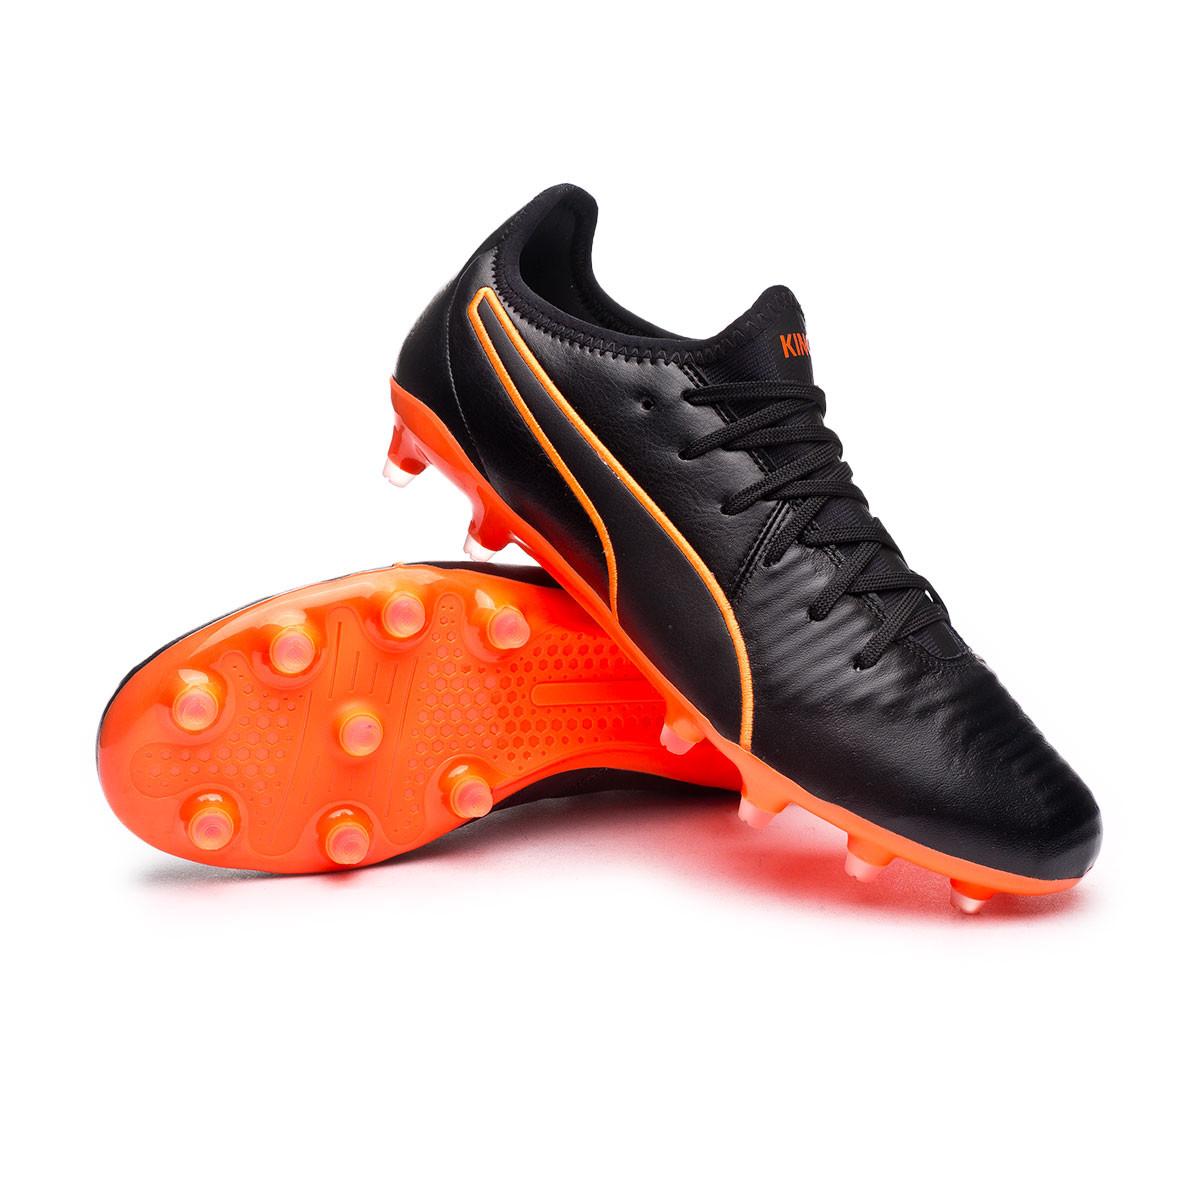 Football Boots Puma KING Pro FG Puma Black-Shocking Orange ...